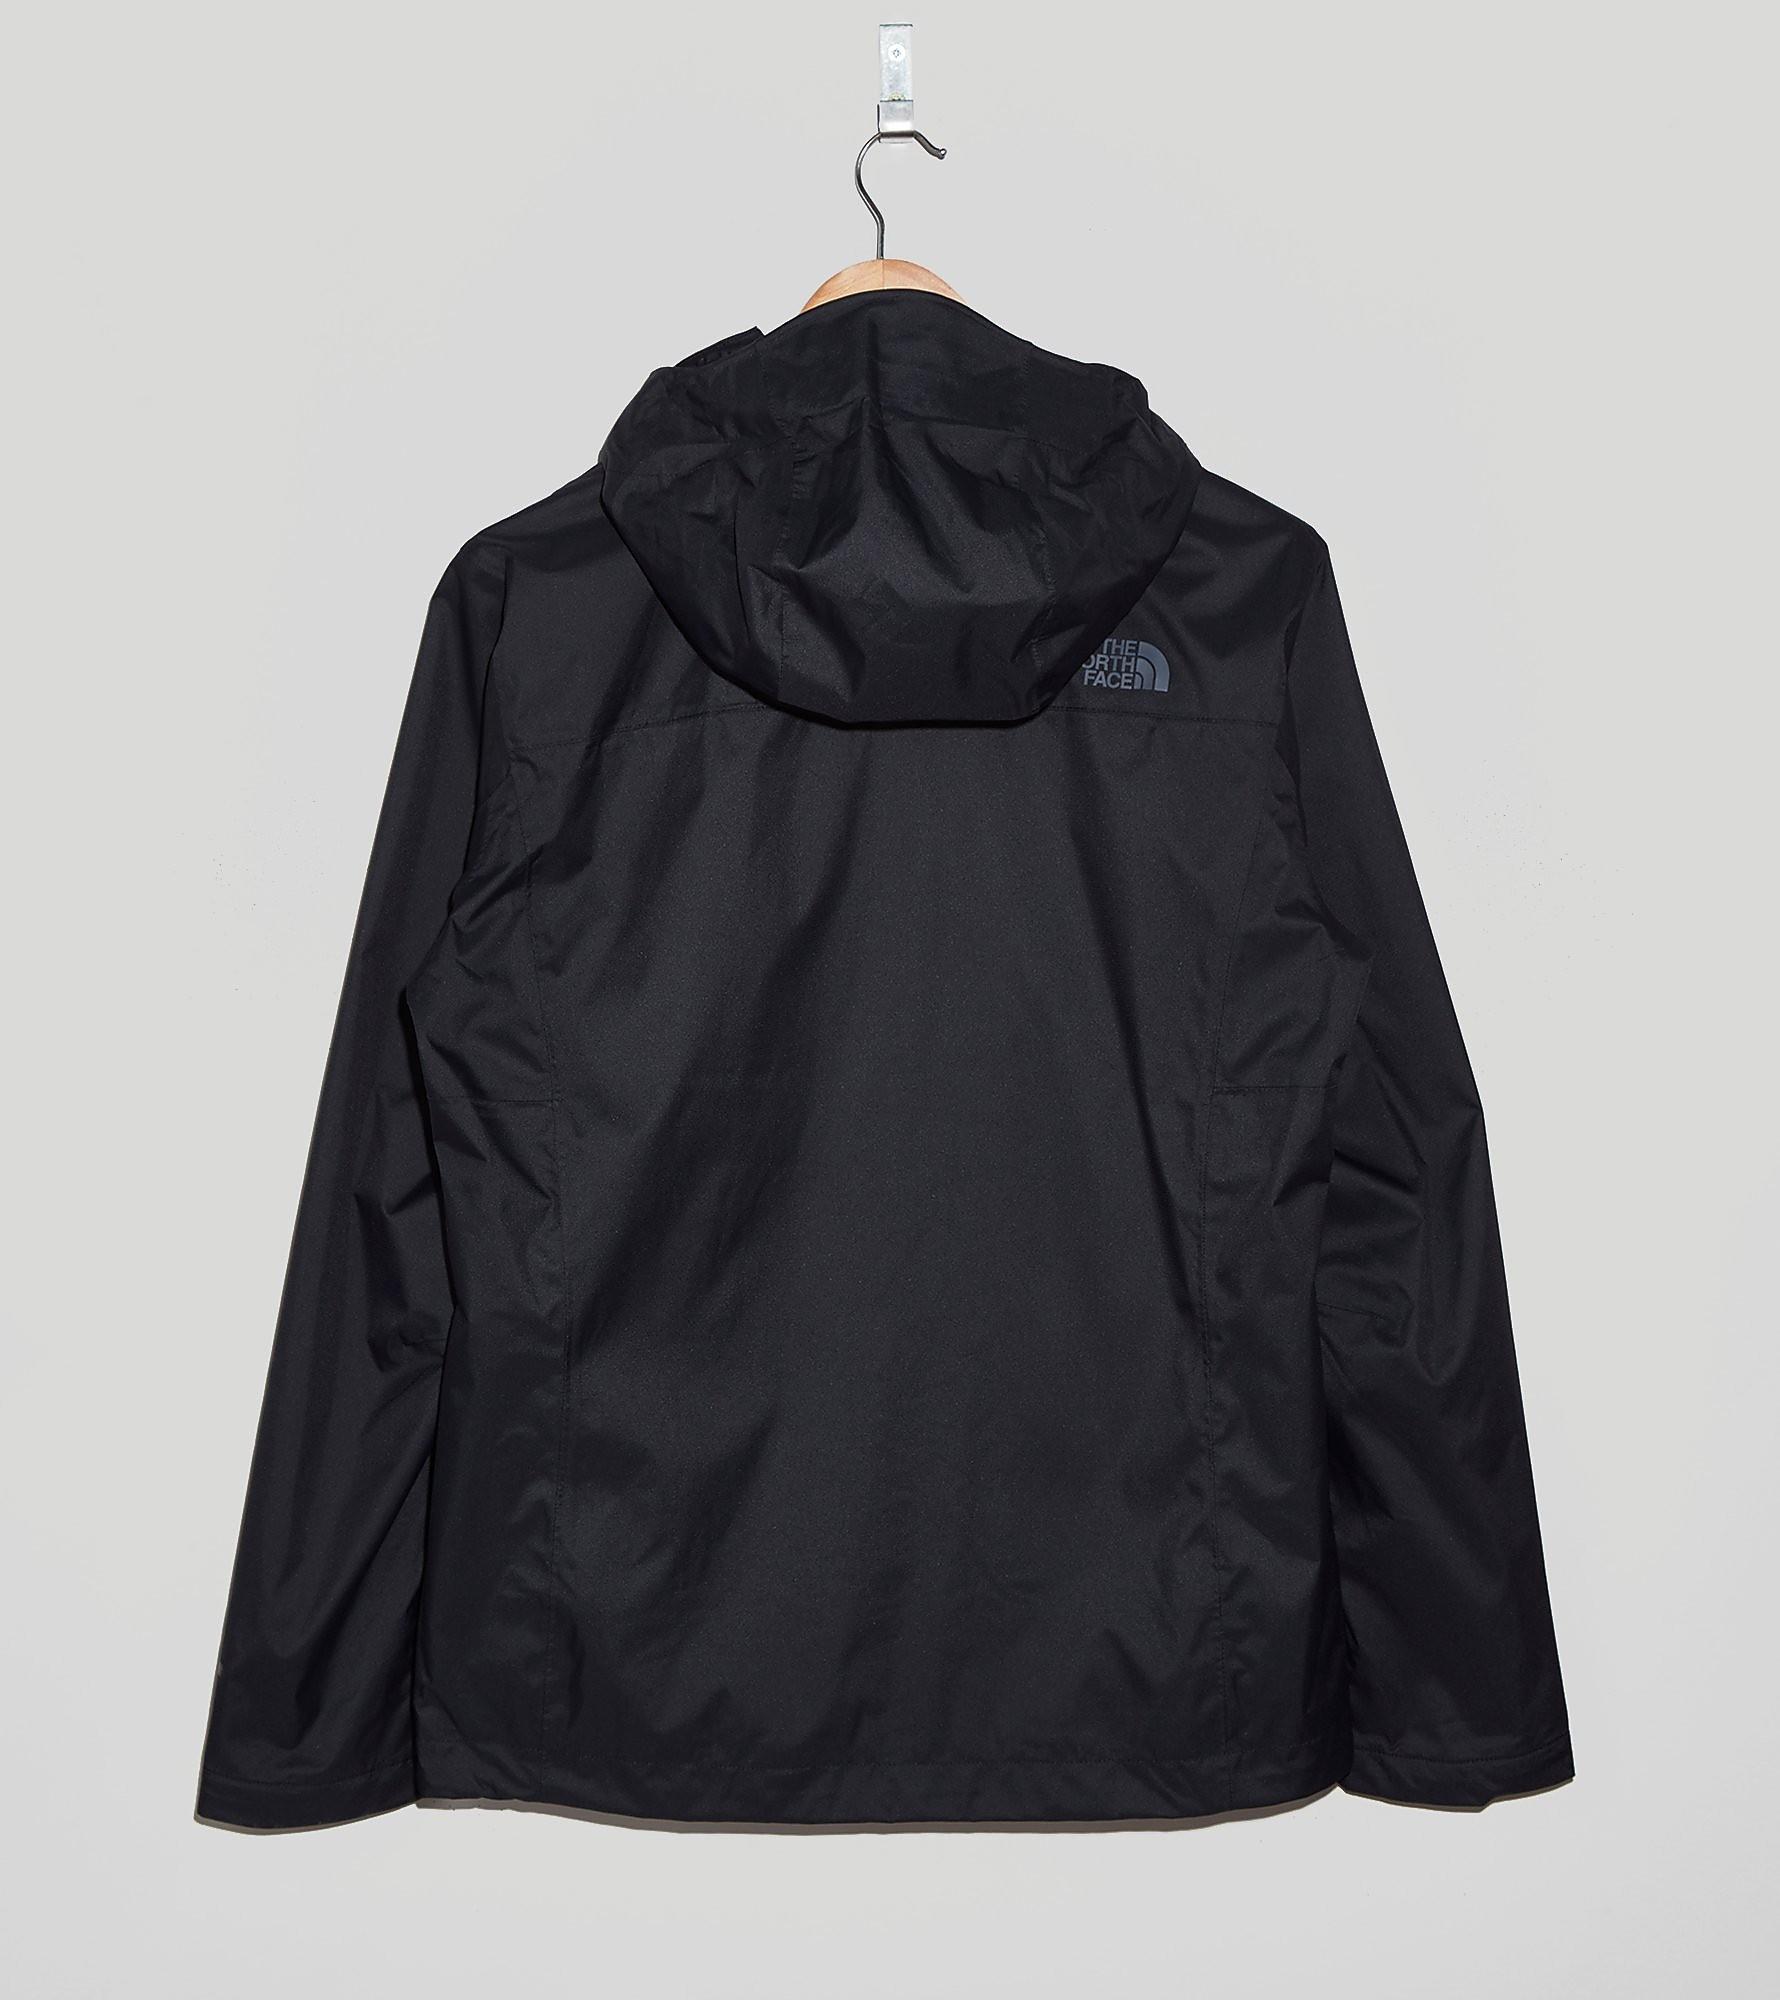 The North Face Arrano Jacket